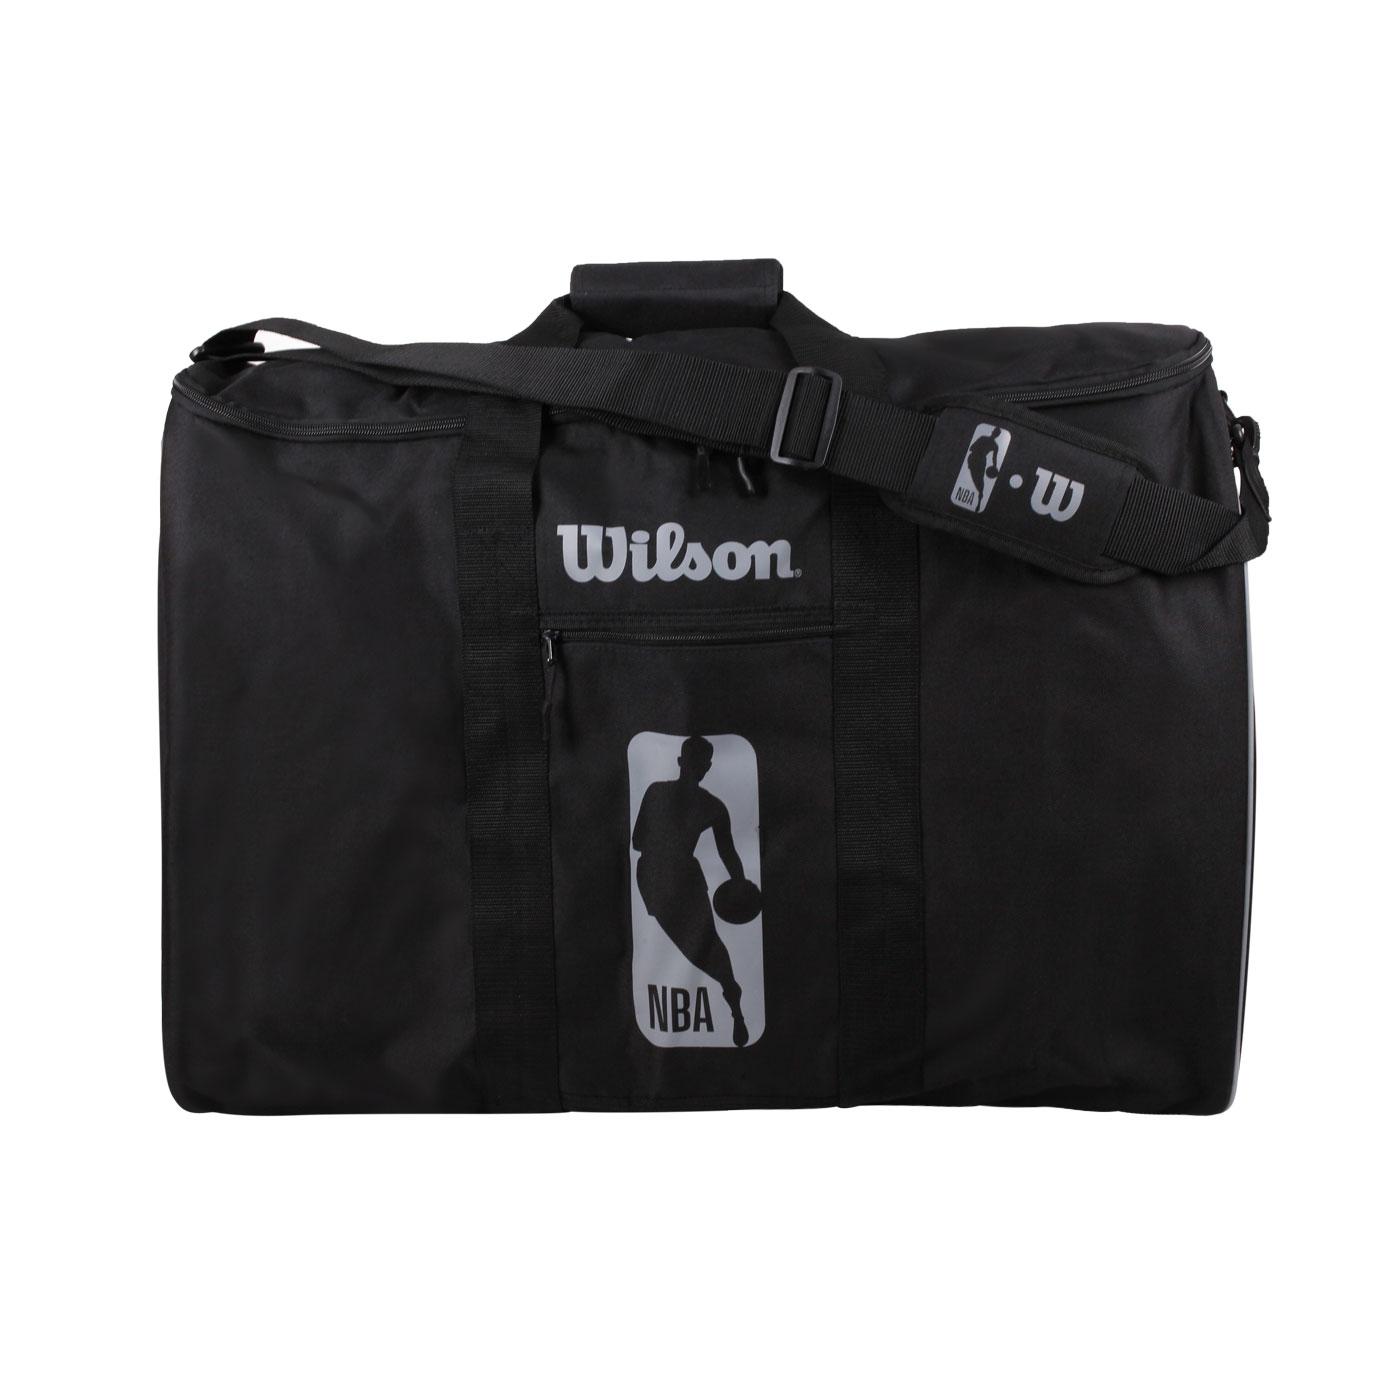 WILSON NBA 6顆裝球袋 WTBA70000